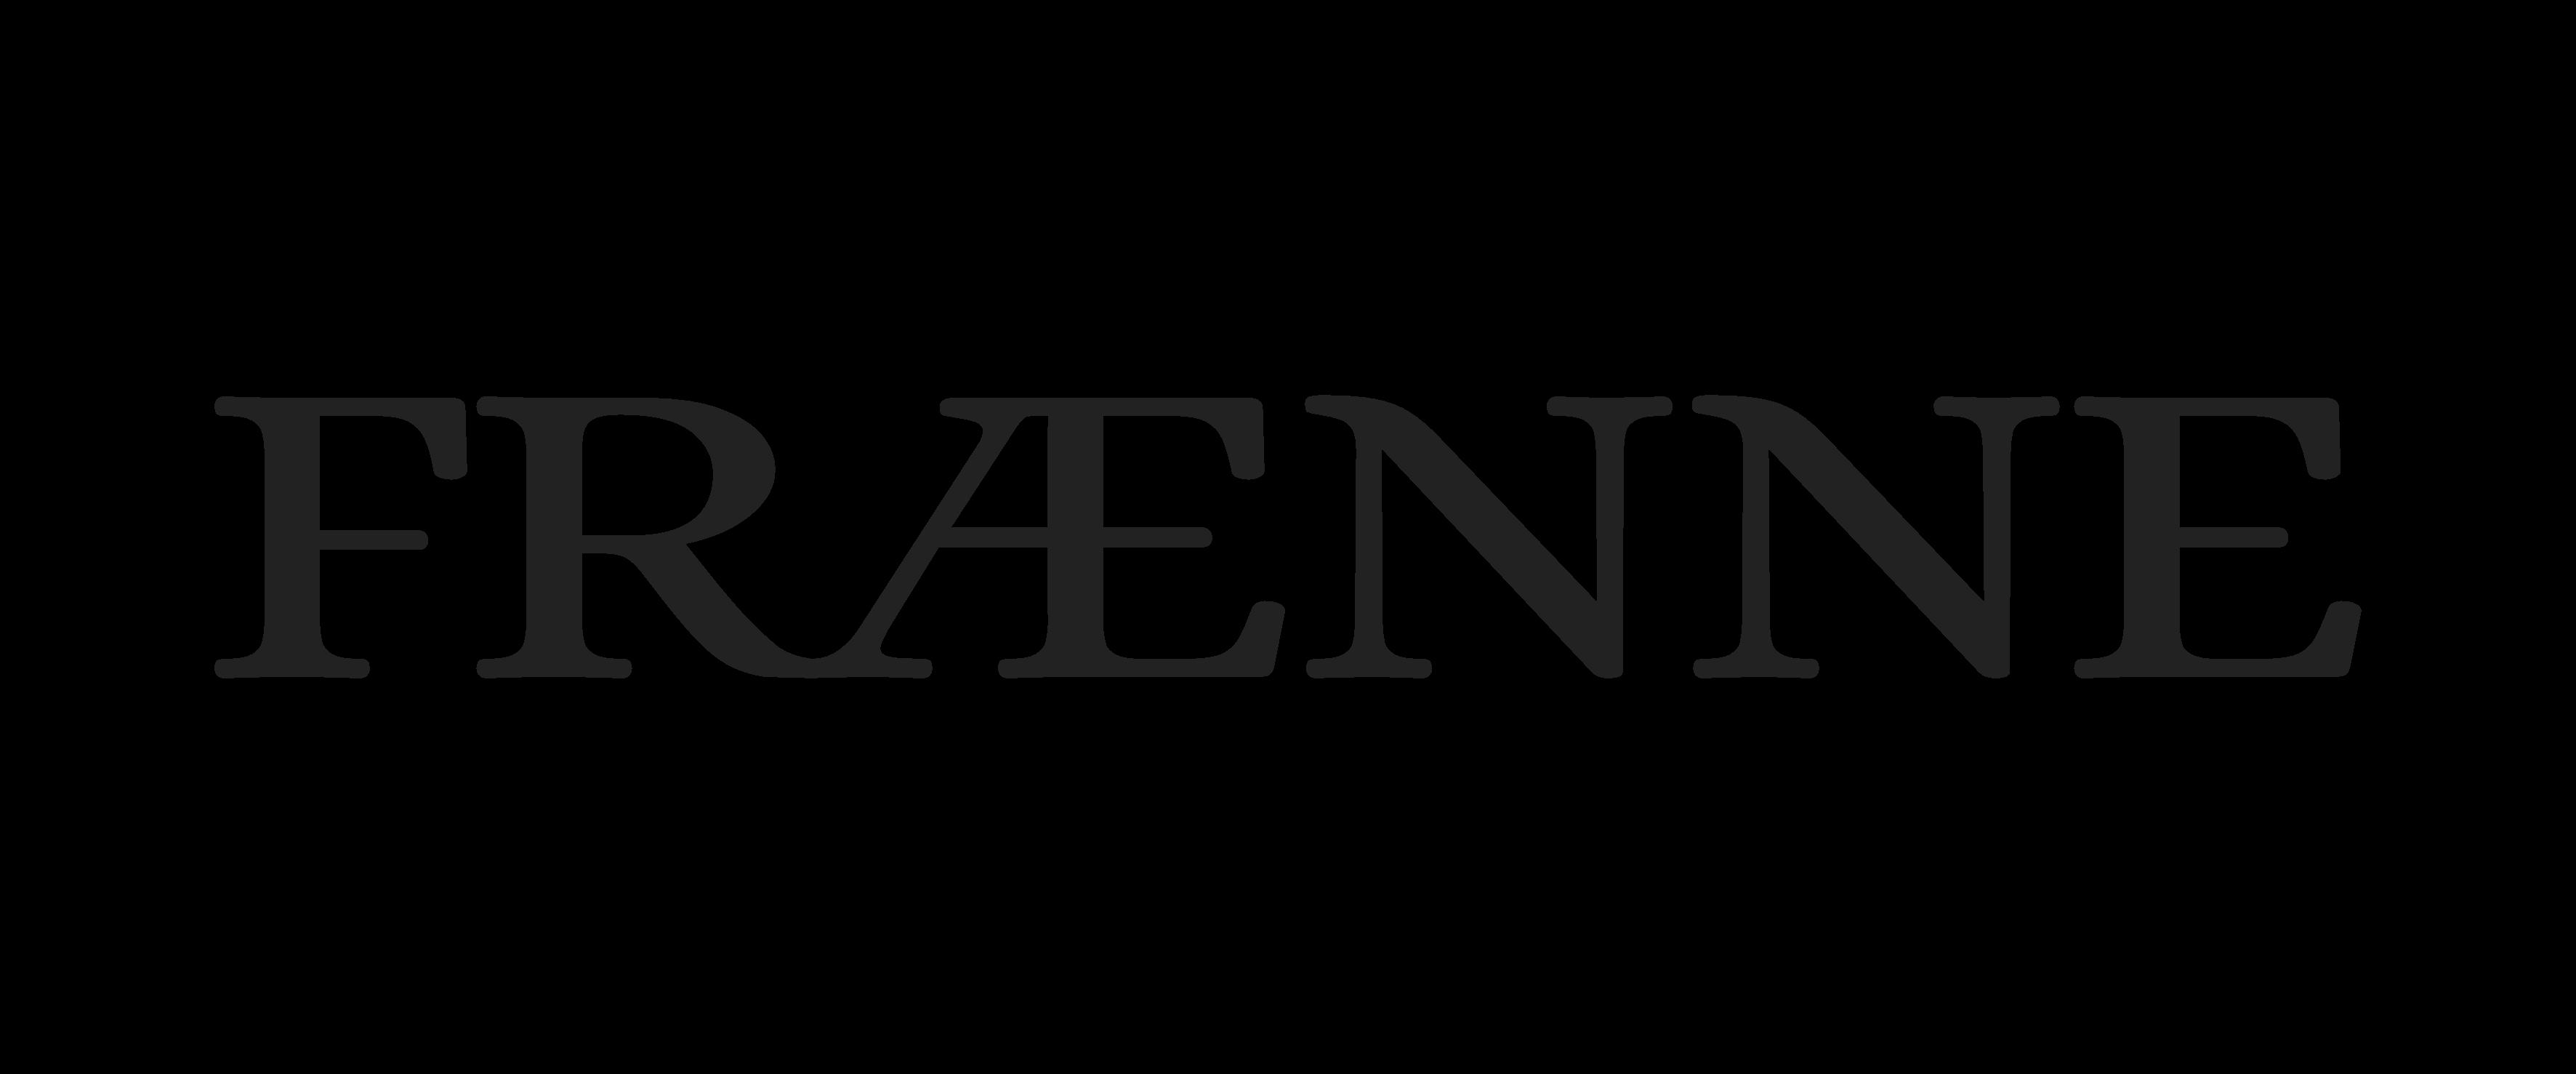 Fraenne Logo